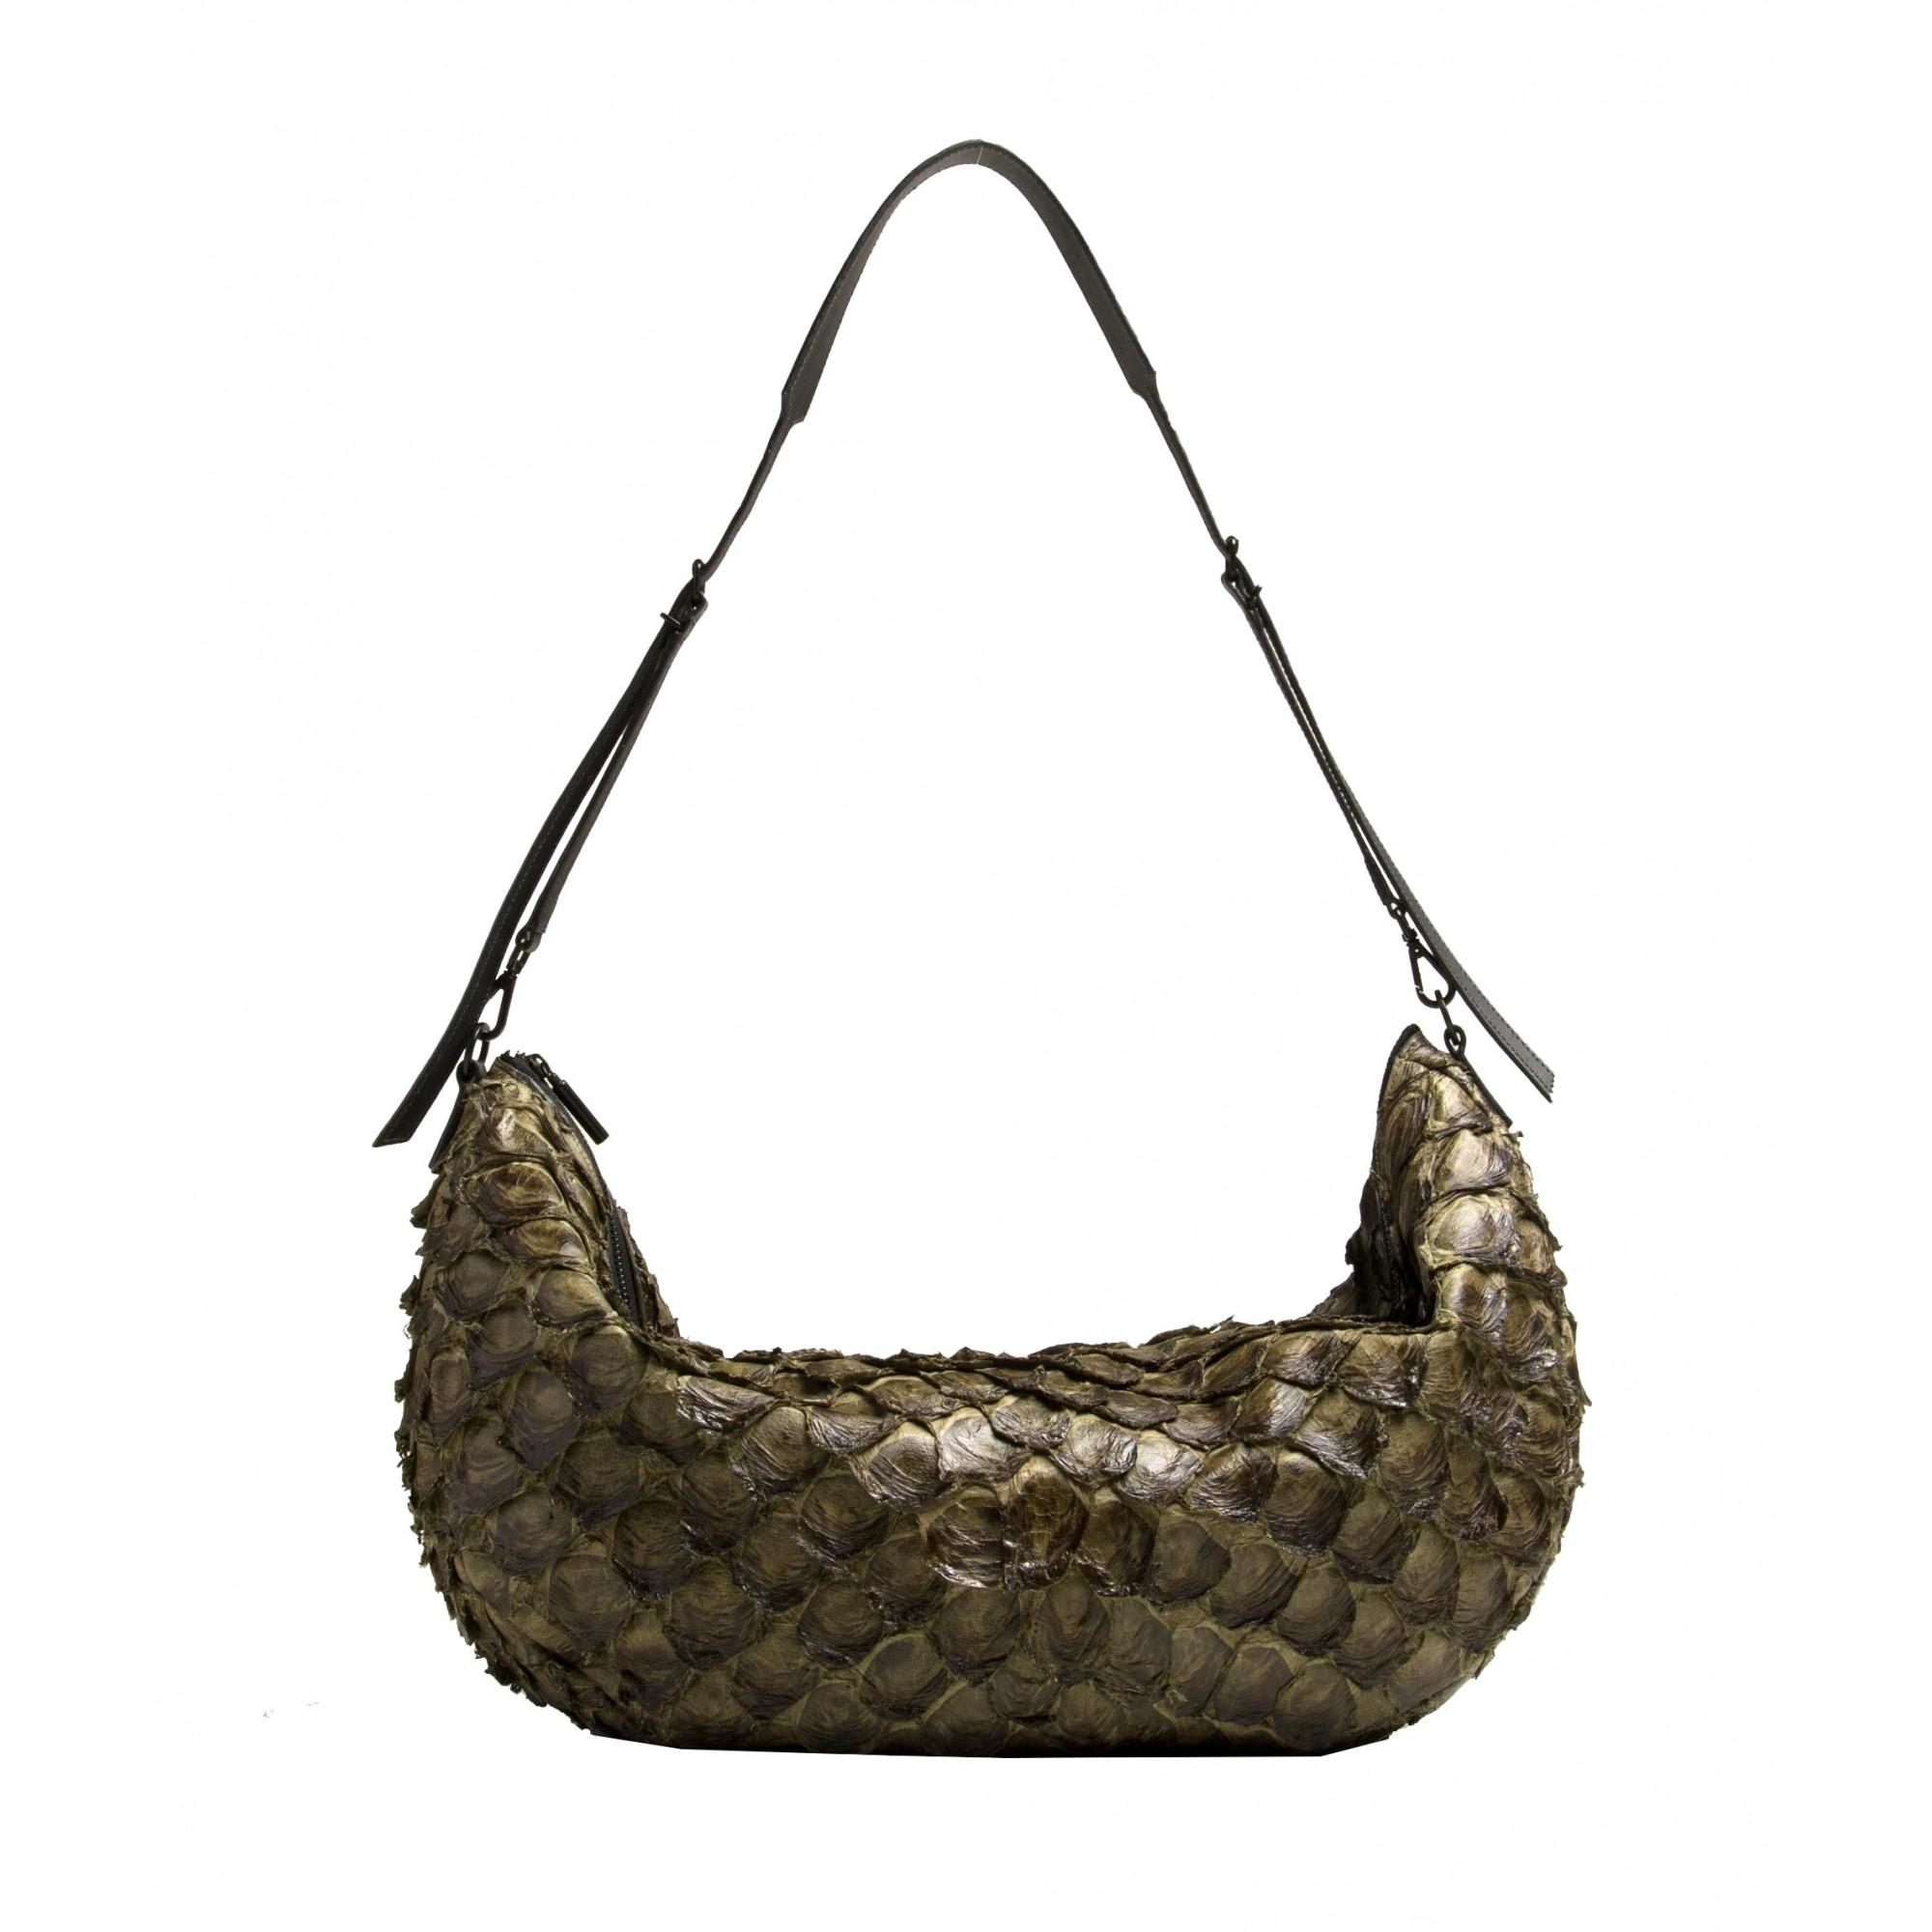 OSKLEN - ANDIROBA PIRARUCU SOFT BAG REF:62147